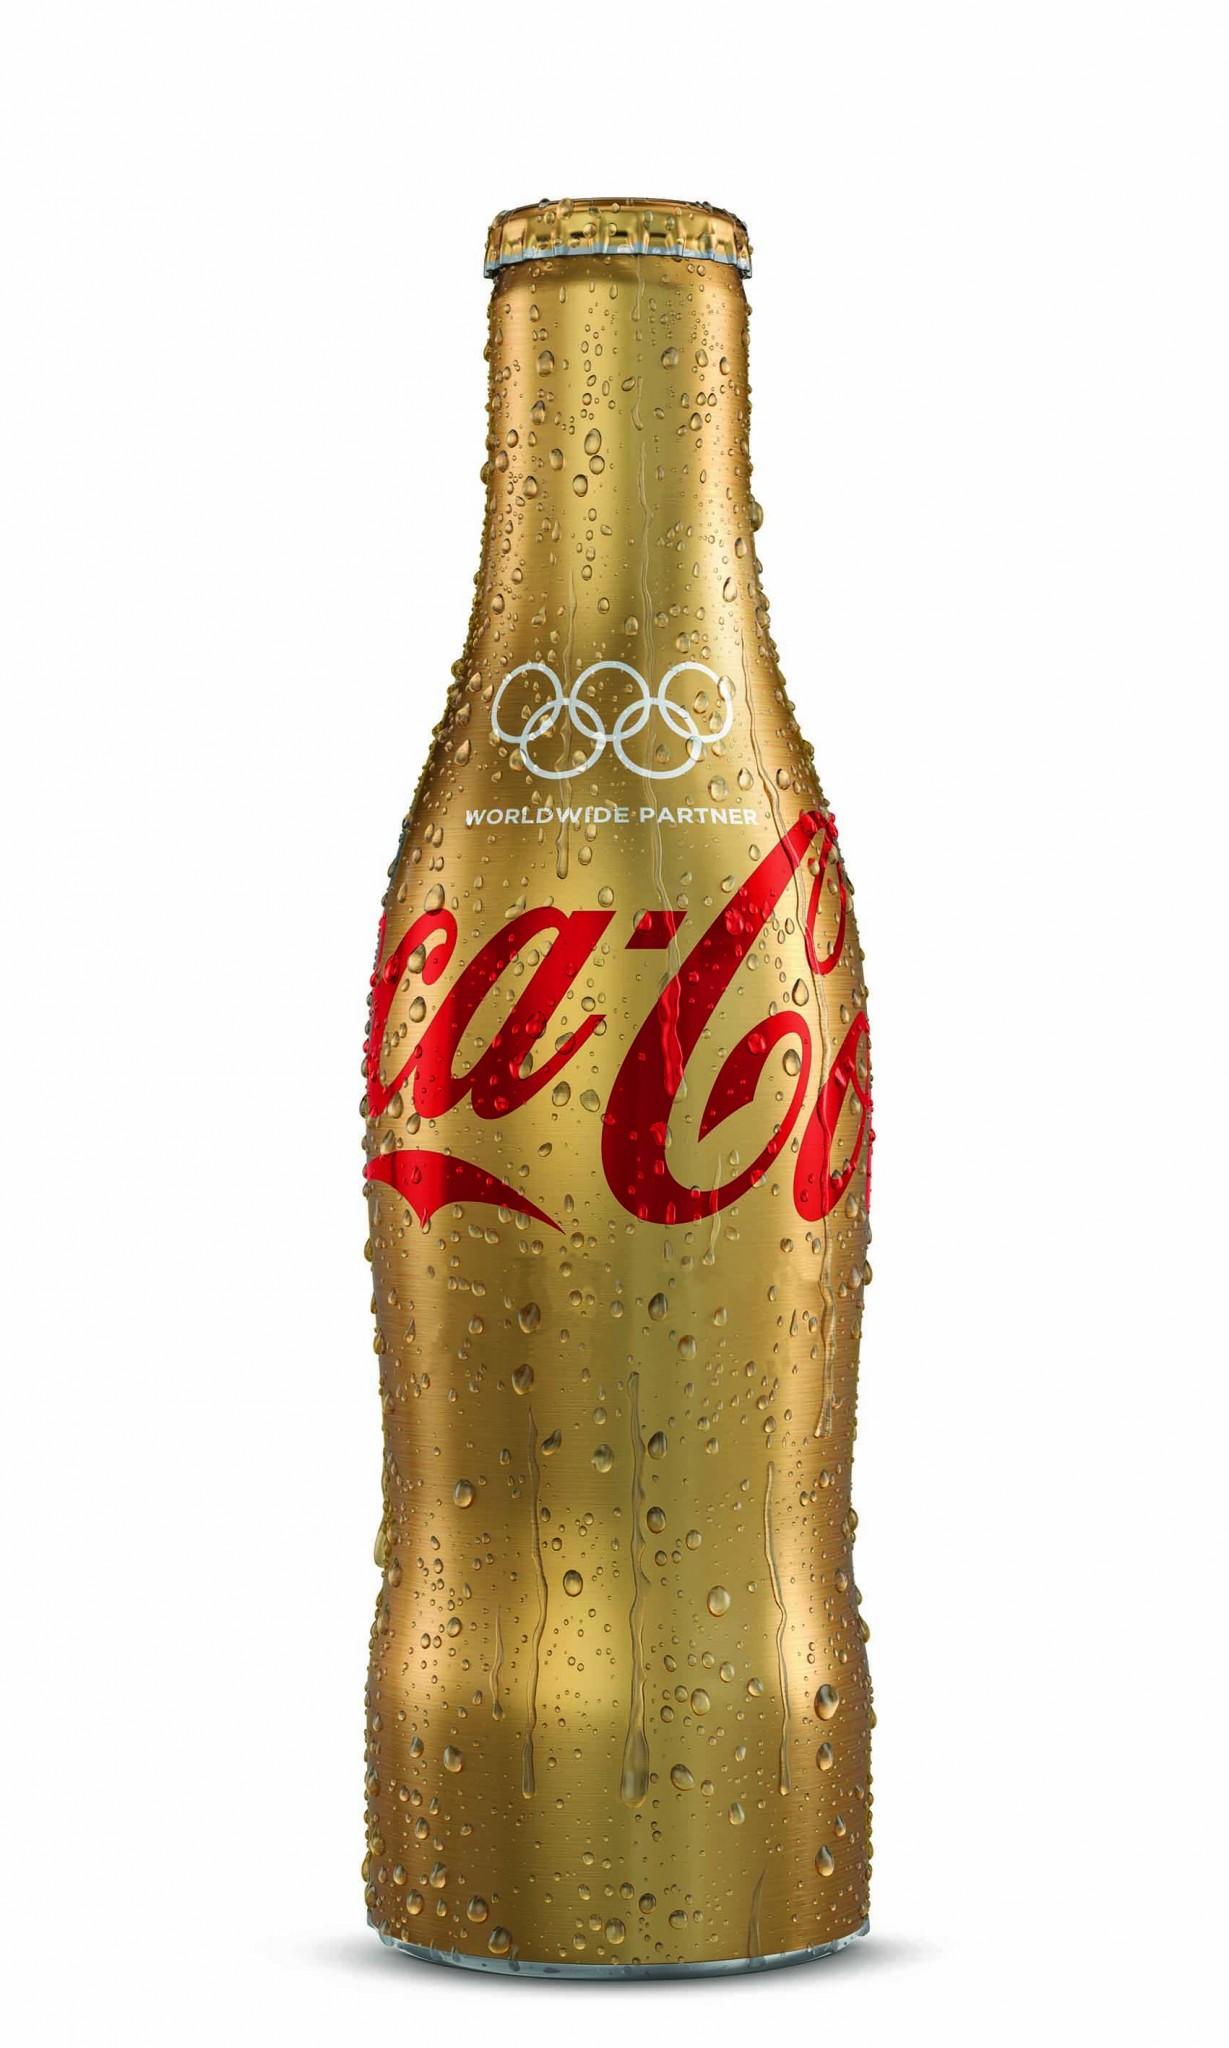 CocaCola_Ouro_GarrafaAluminio_250ml_CMYK_FINAL